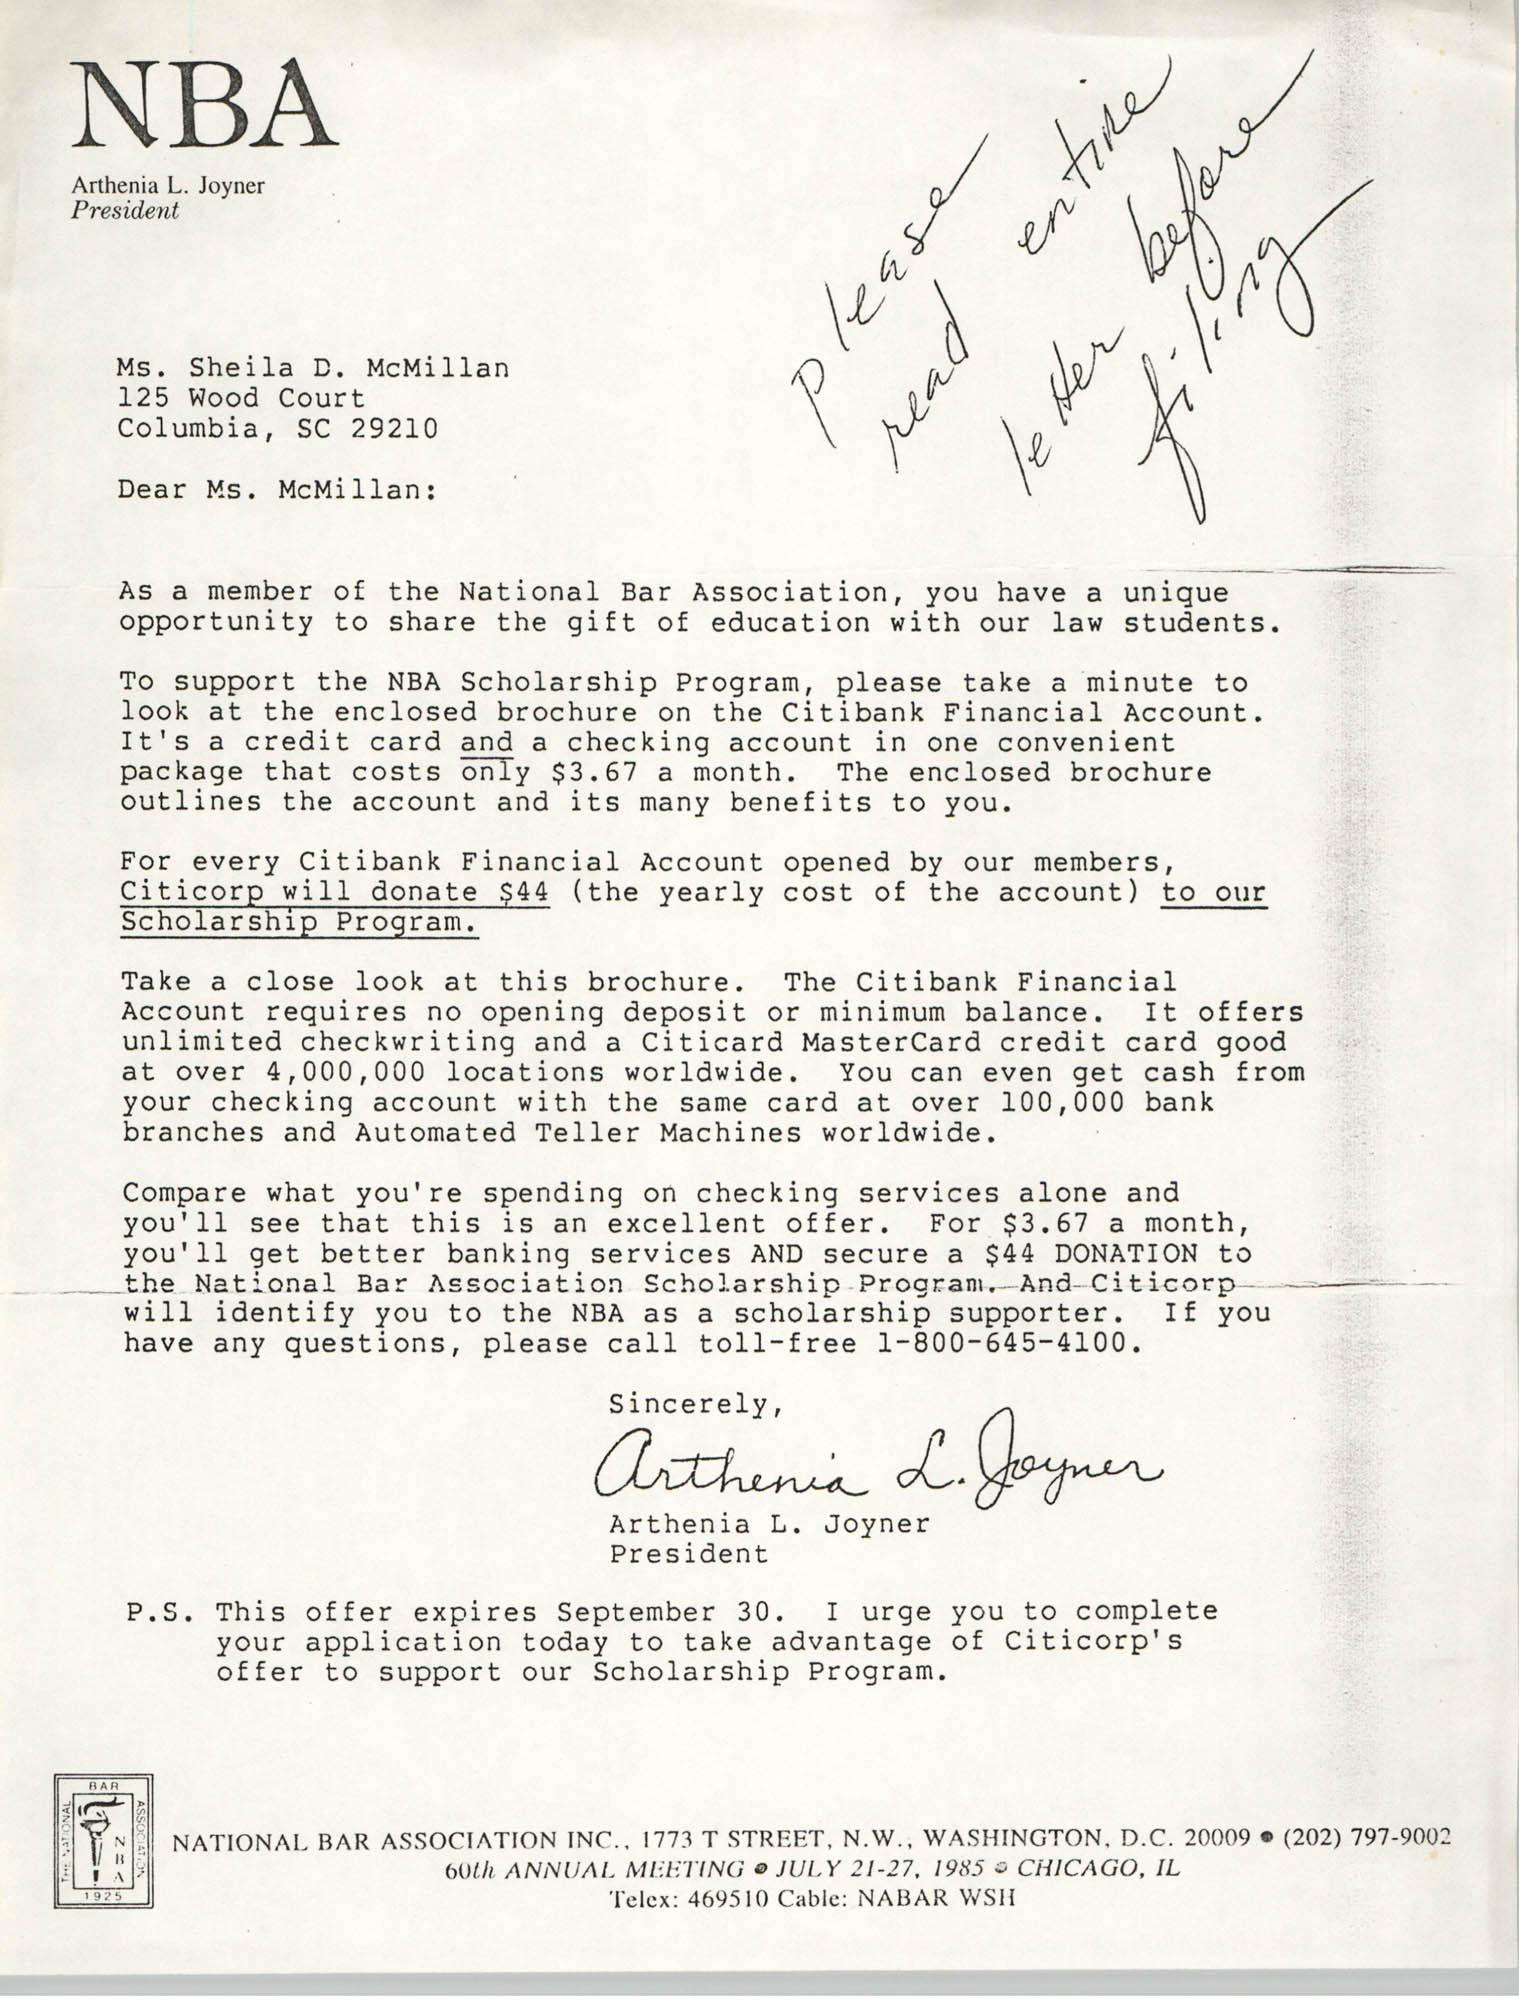 Letter from Arthenia L. Joyner to Sheila McMillan